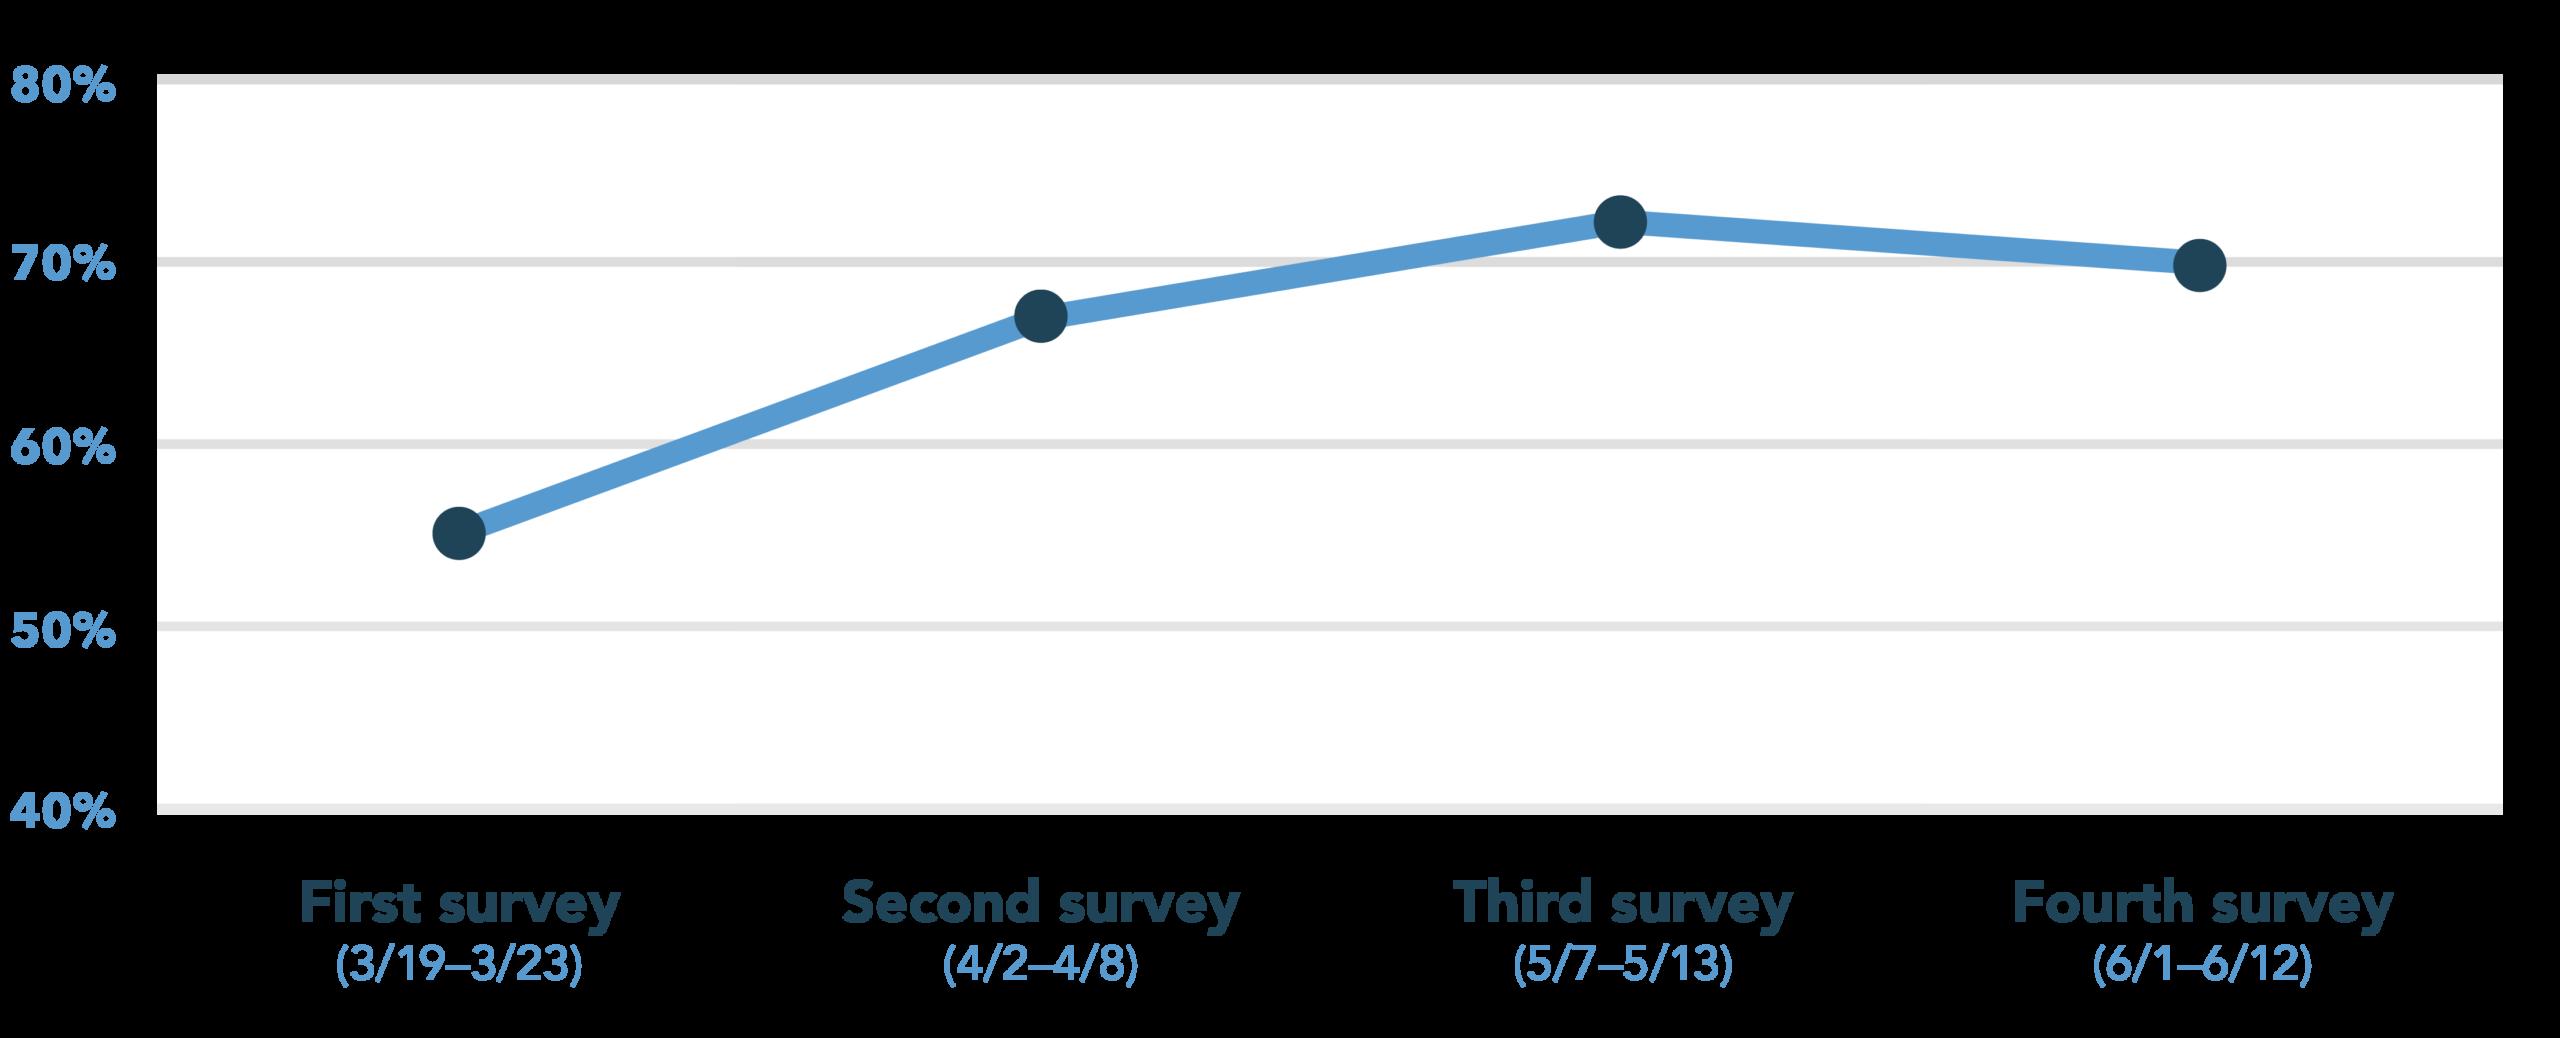 Our latest surveys showed willingness between 55–72%.